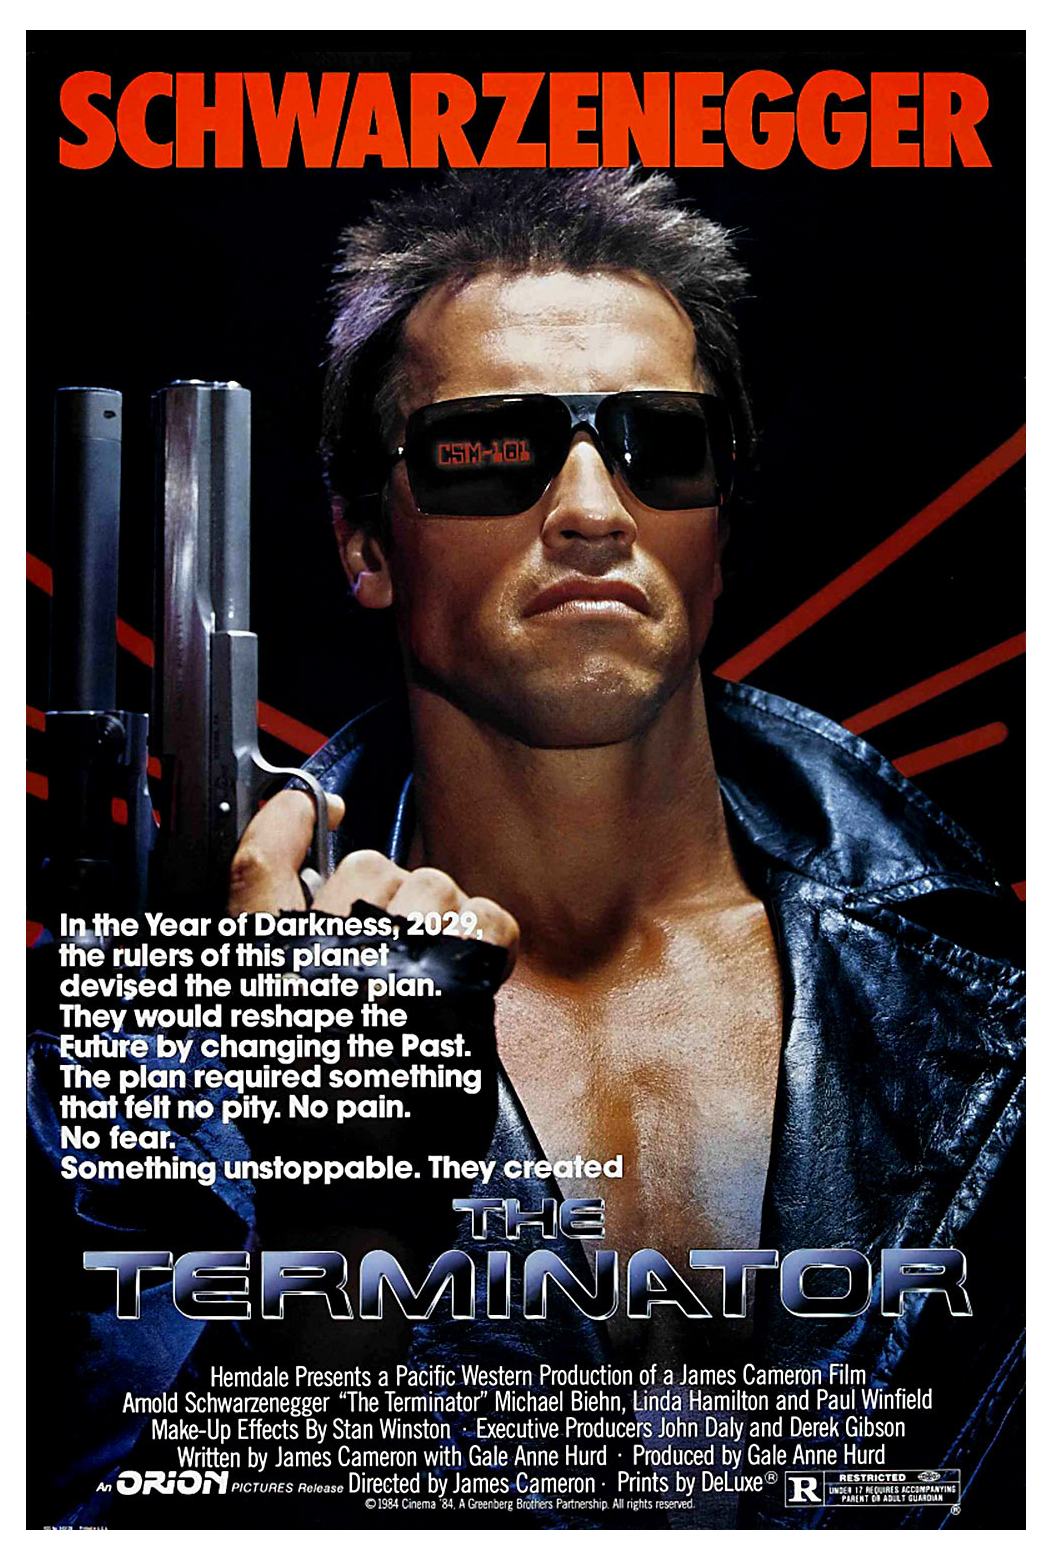 http://70srichard.wordpress.com/2014/12/15/the-terminator/